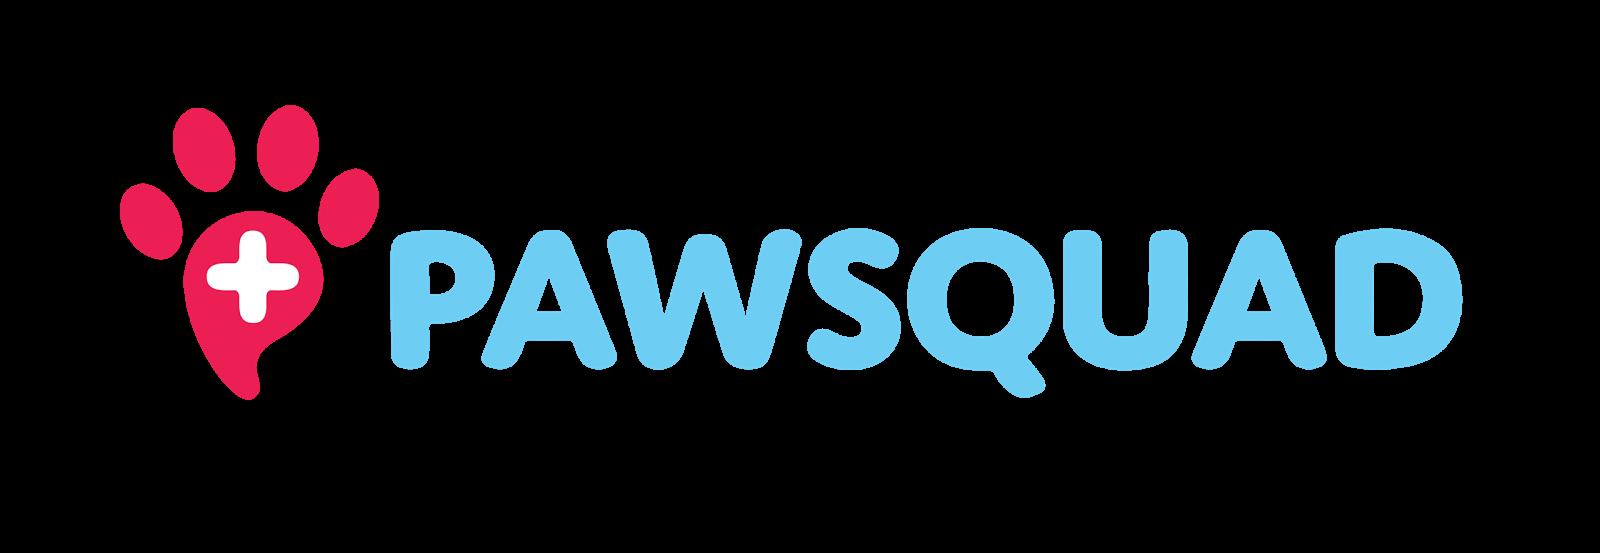 pawsquad logo